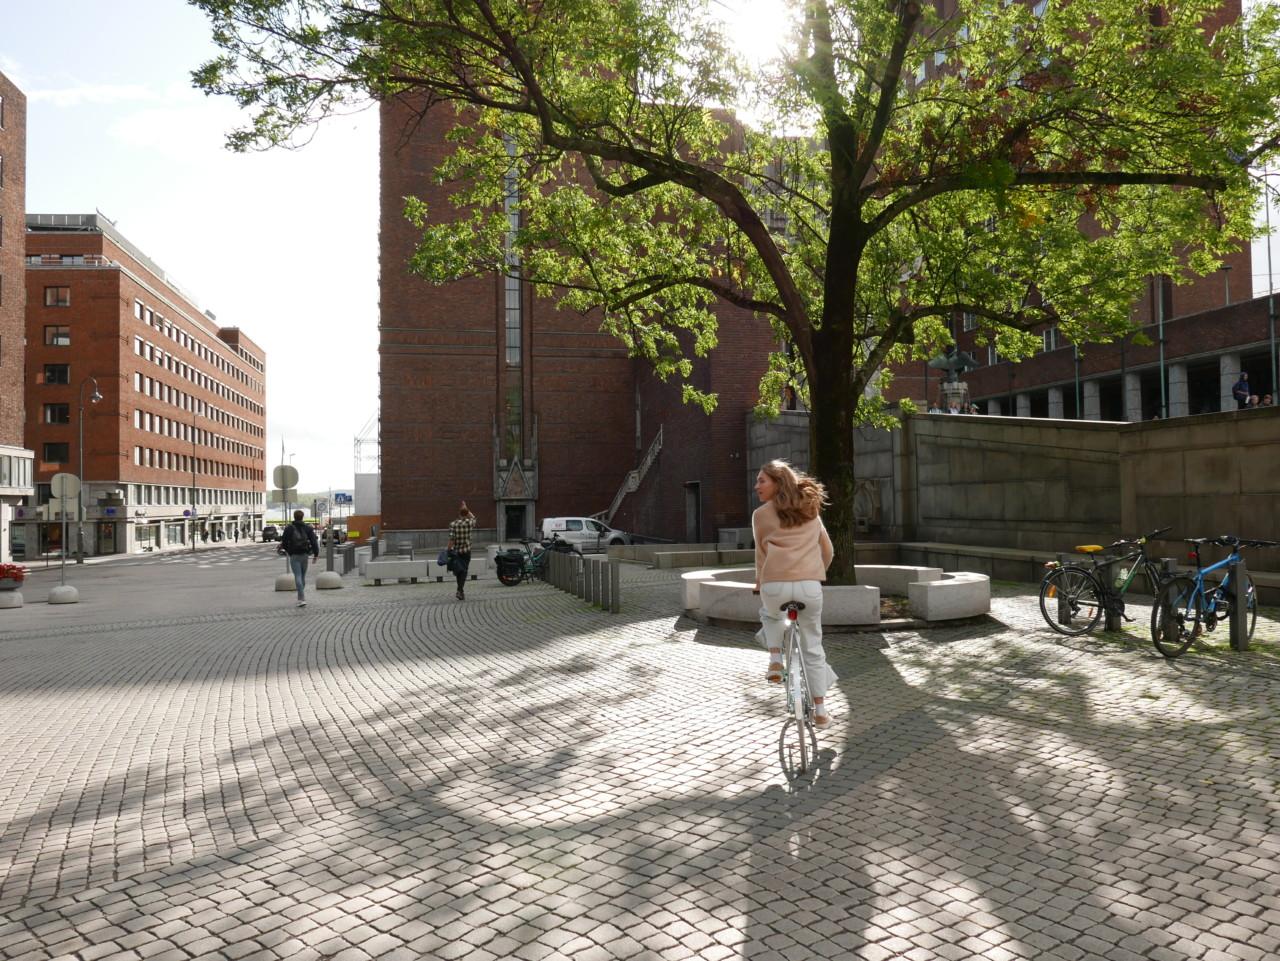 bysyklist-i-oslo-green-house